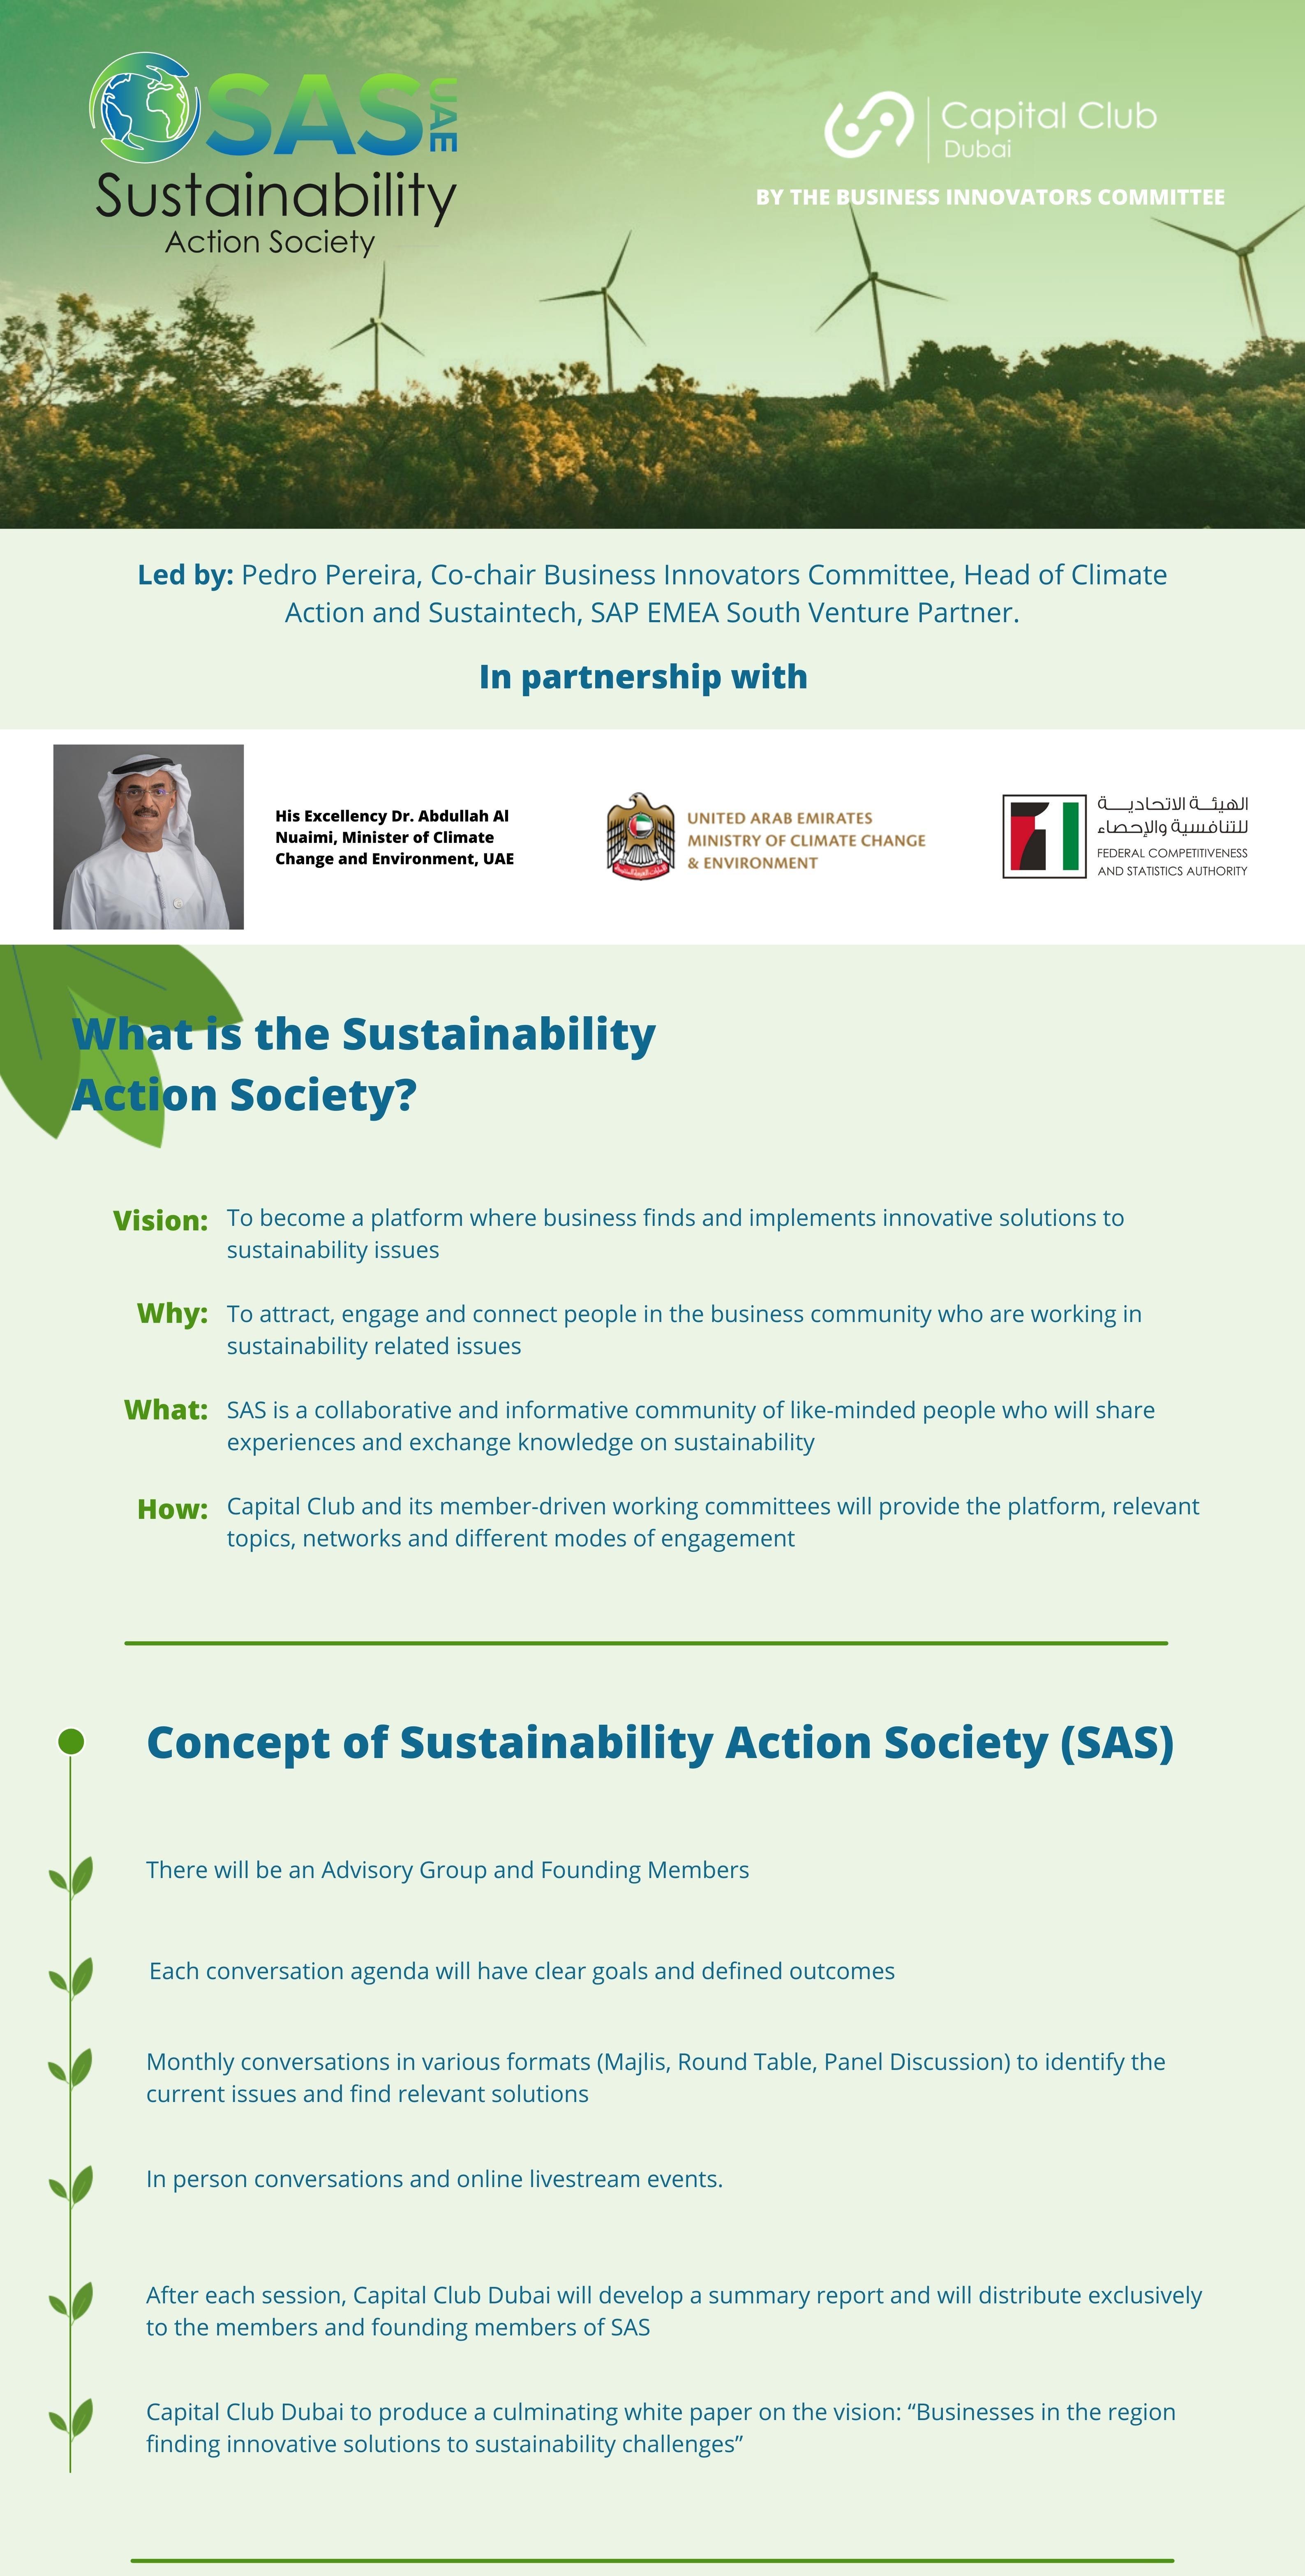 Sustainability Action Society